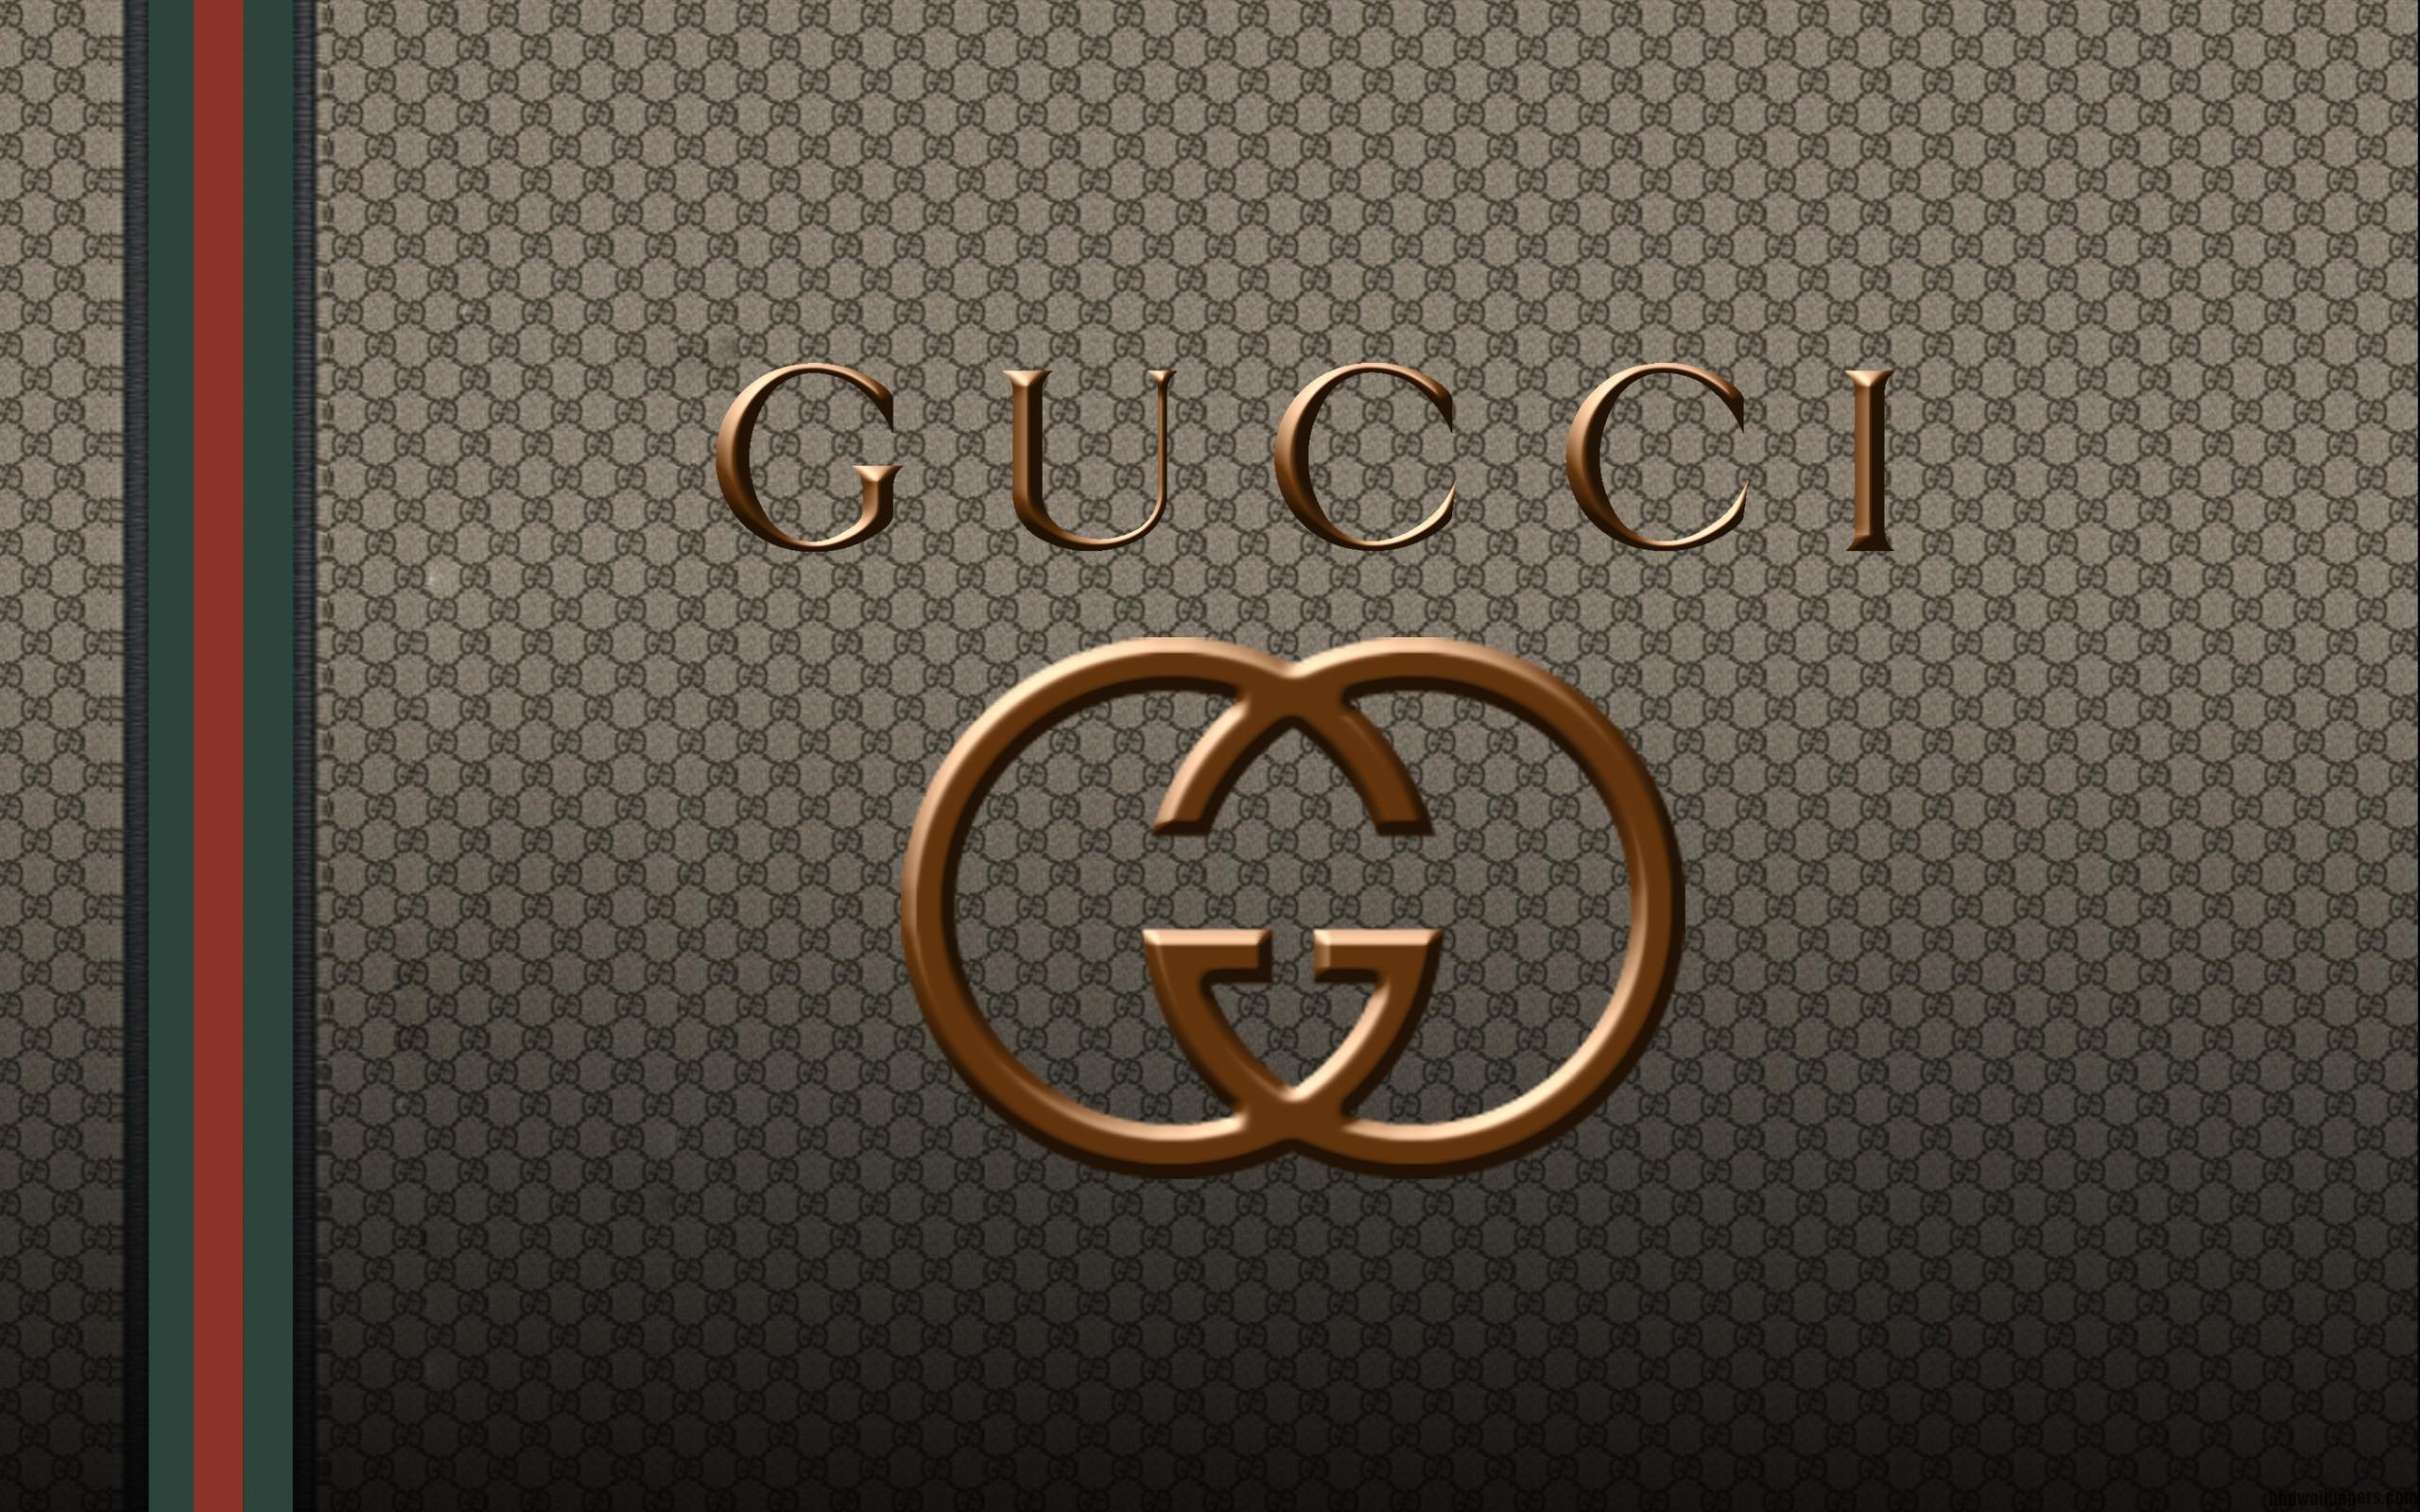 Gucci Wallpaper 7   2560 X 1600 stmednet 2560x1600